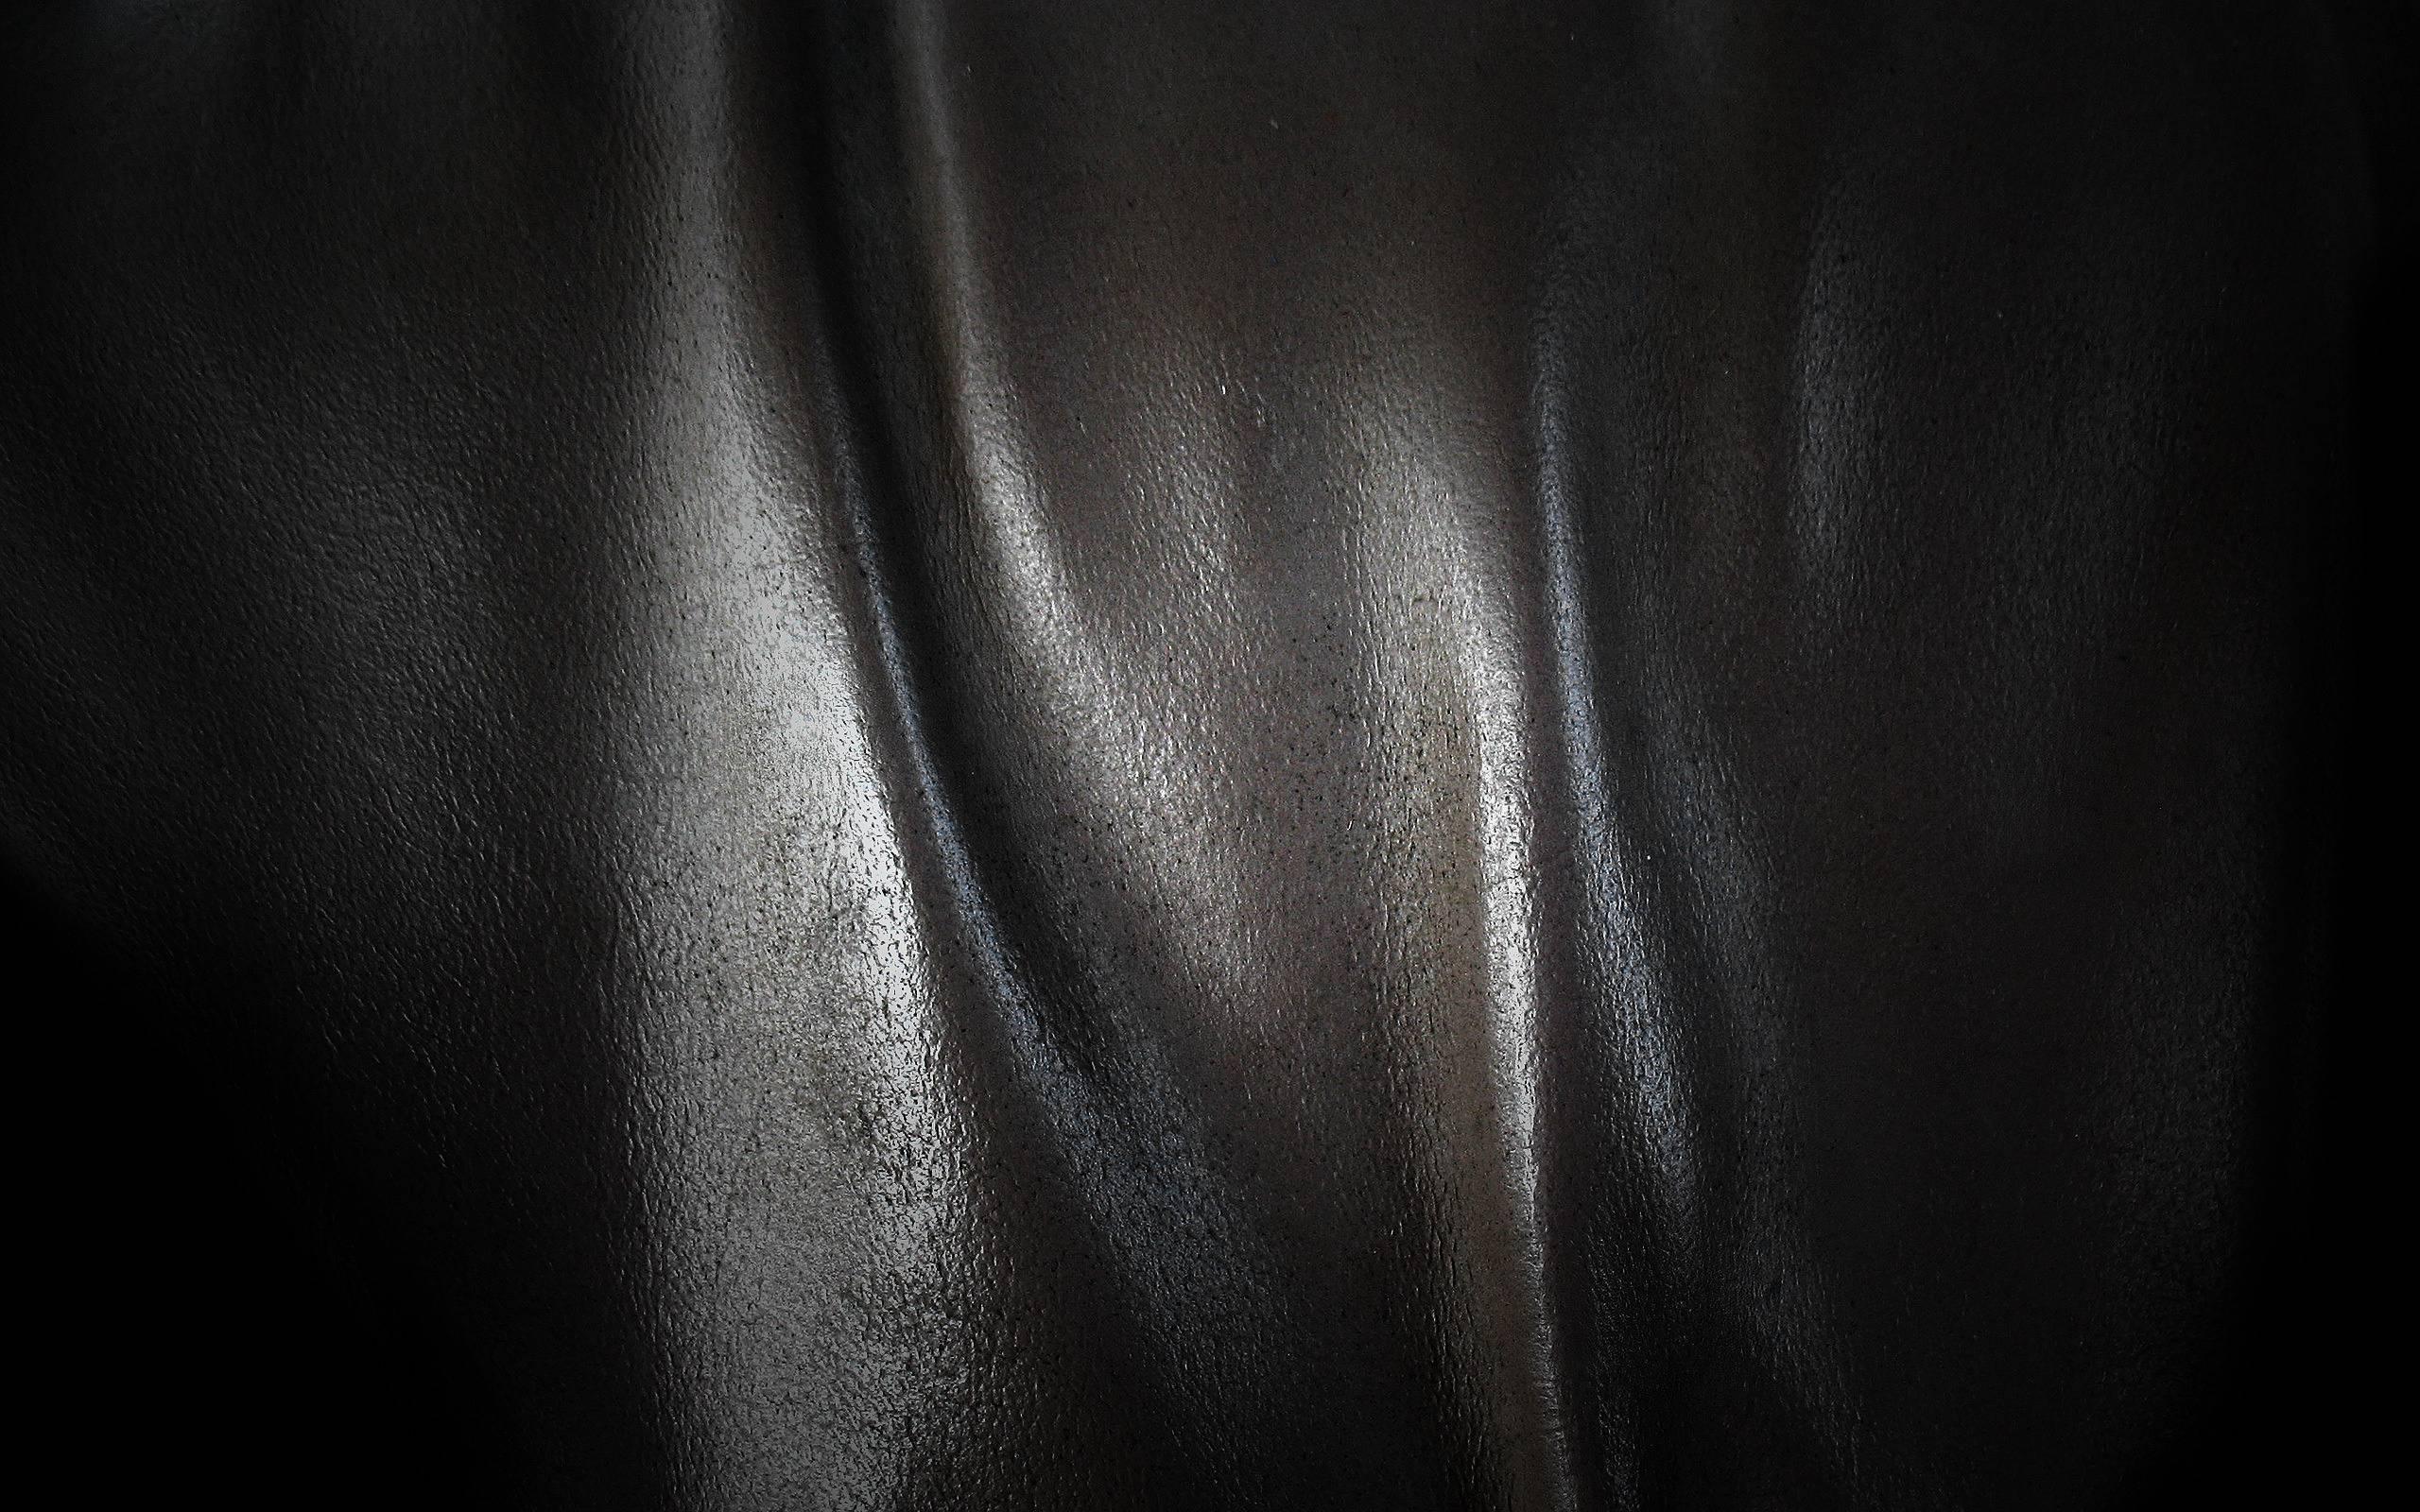 black texture wallpaper hd - photo #7